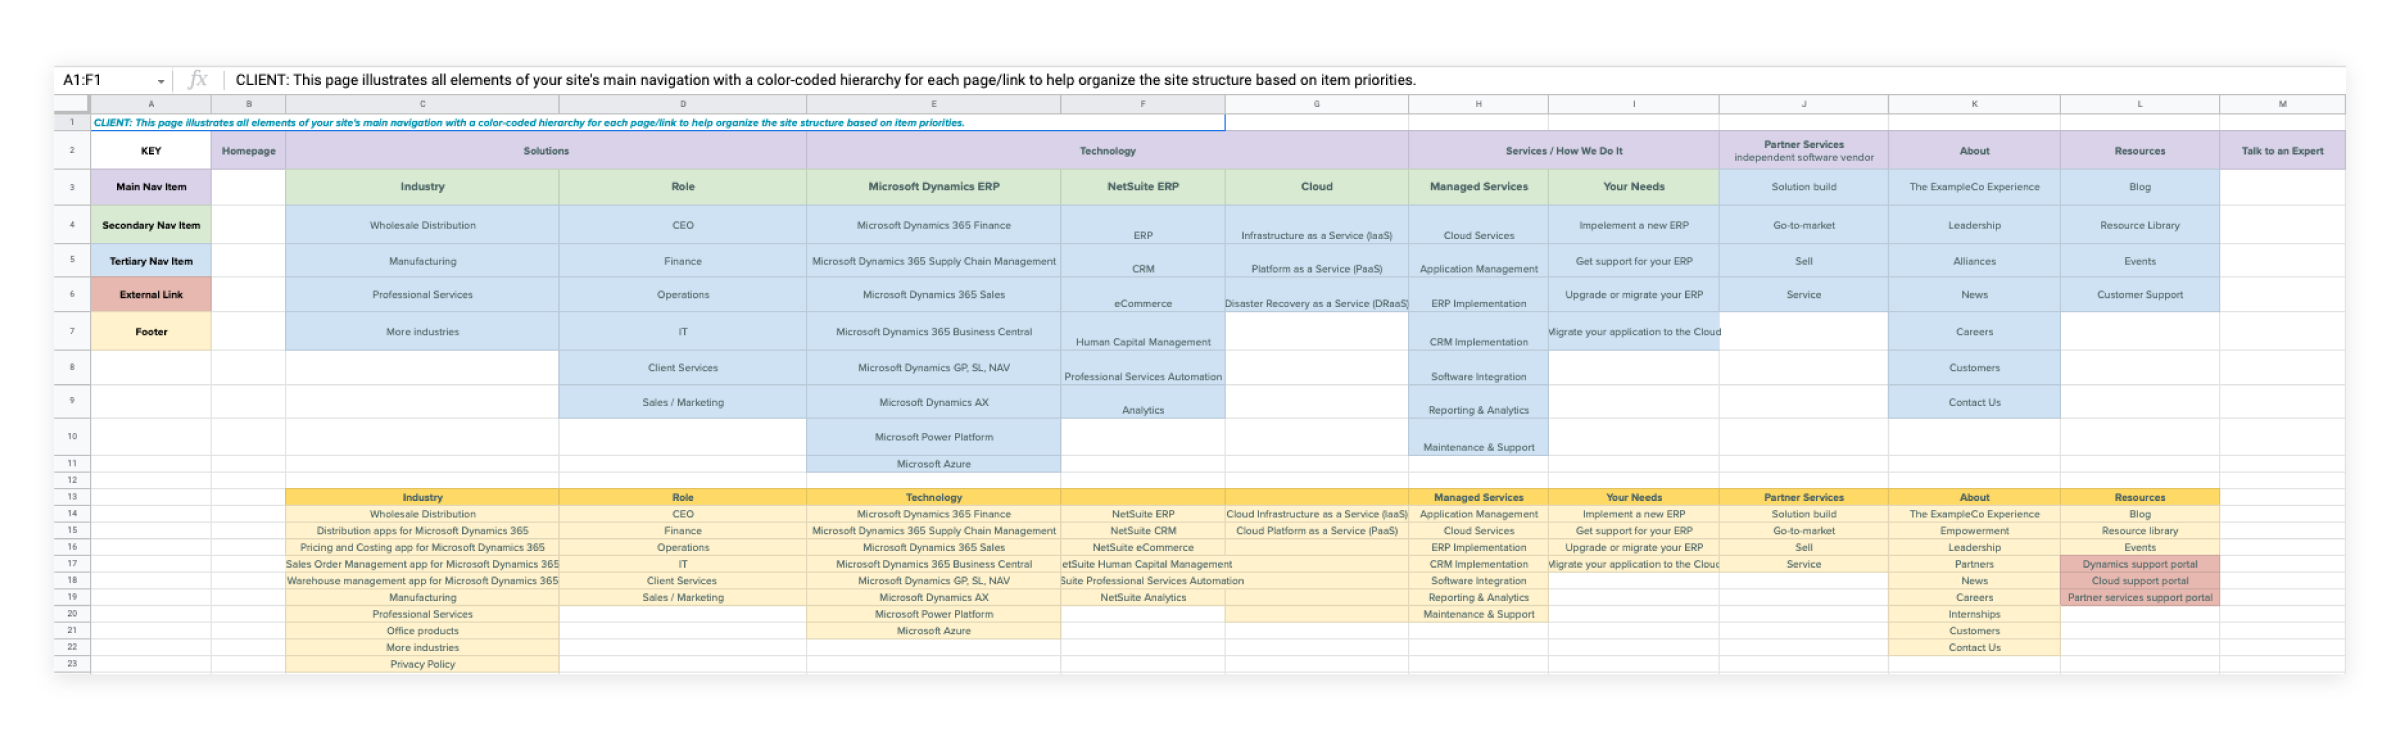 21-02-SRW client involvement-Sitemap